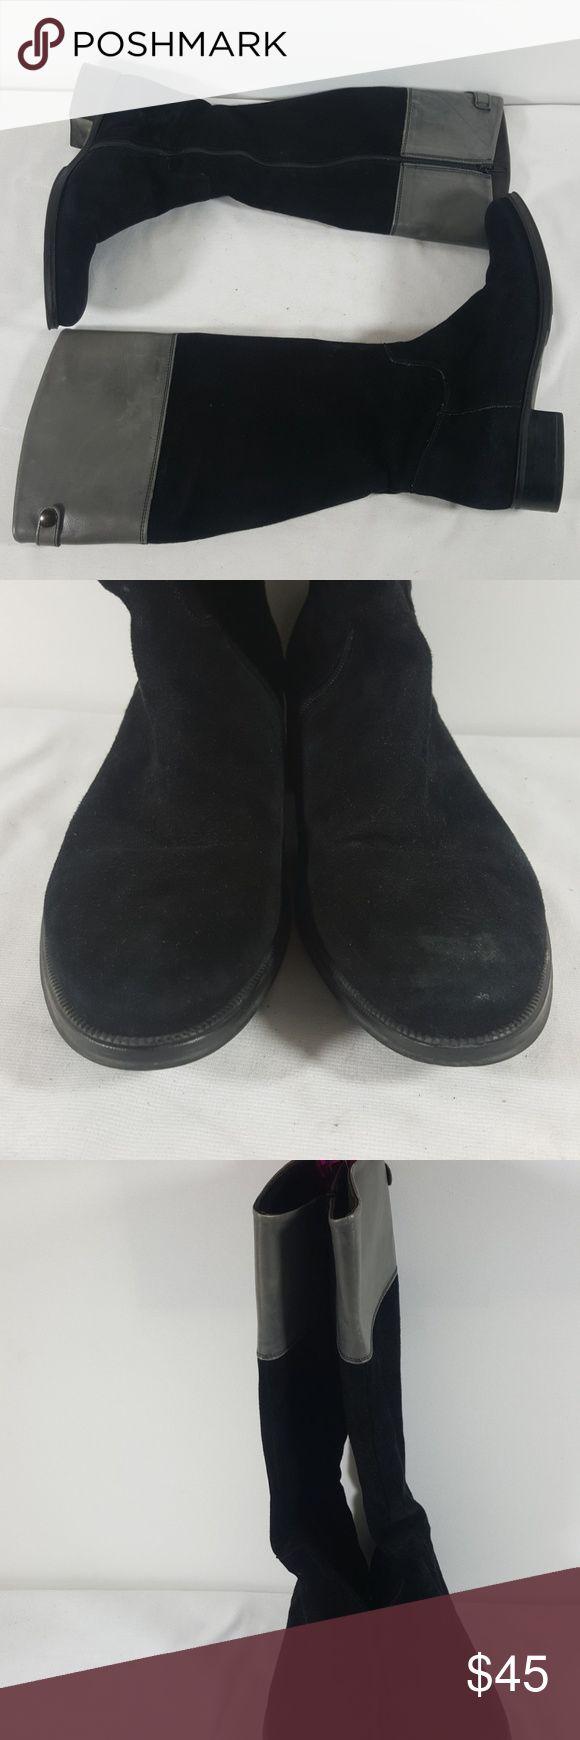 "Steven Dann by Tremp black/gray suede boots 38 1/2 Steven Dann by Tremp black/gray suede boots. Side zipper closure.  Size 38 1/2 Low heel 1""  Item-394 Steven Dann by Tremp Shoes Heeled Boots"